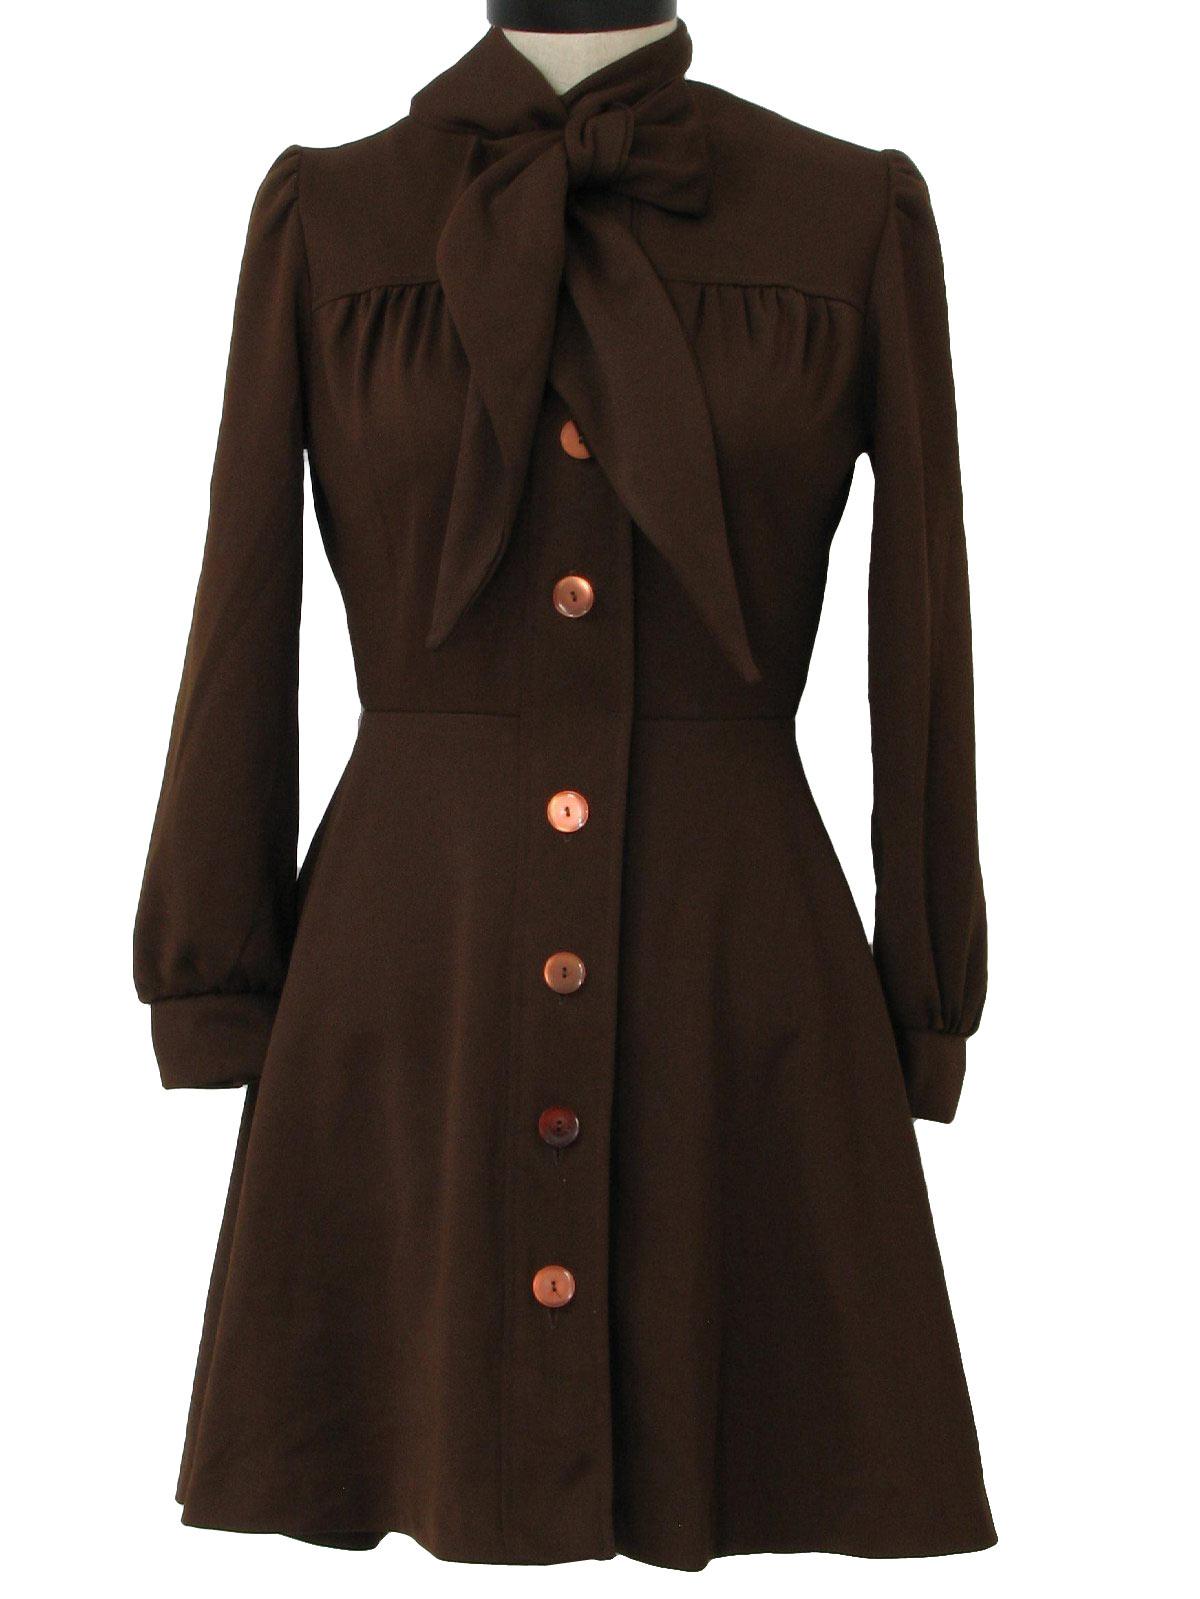 Brown Long Sleeve Dress